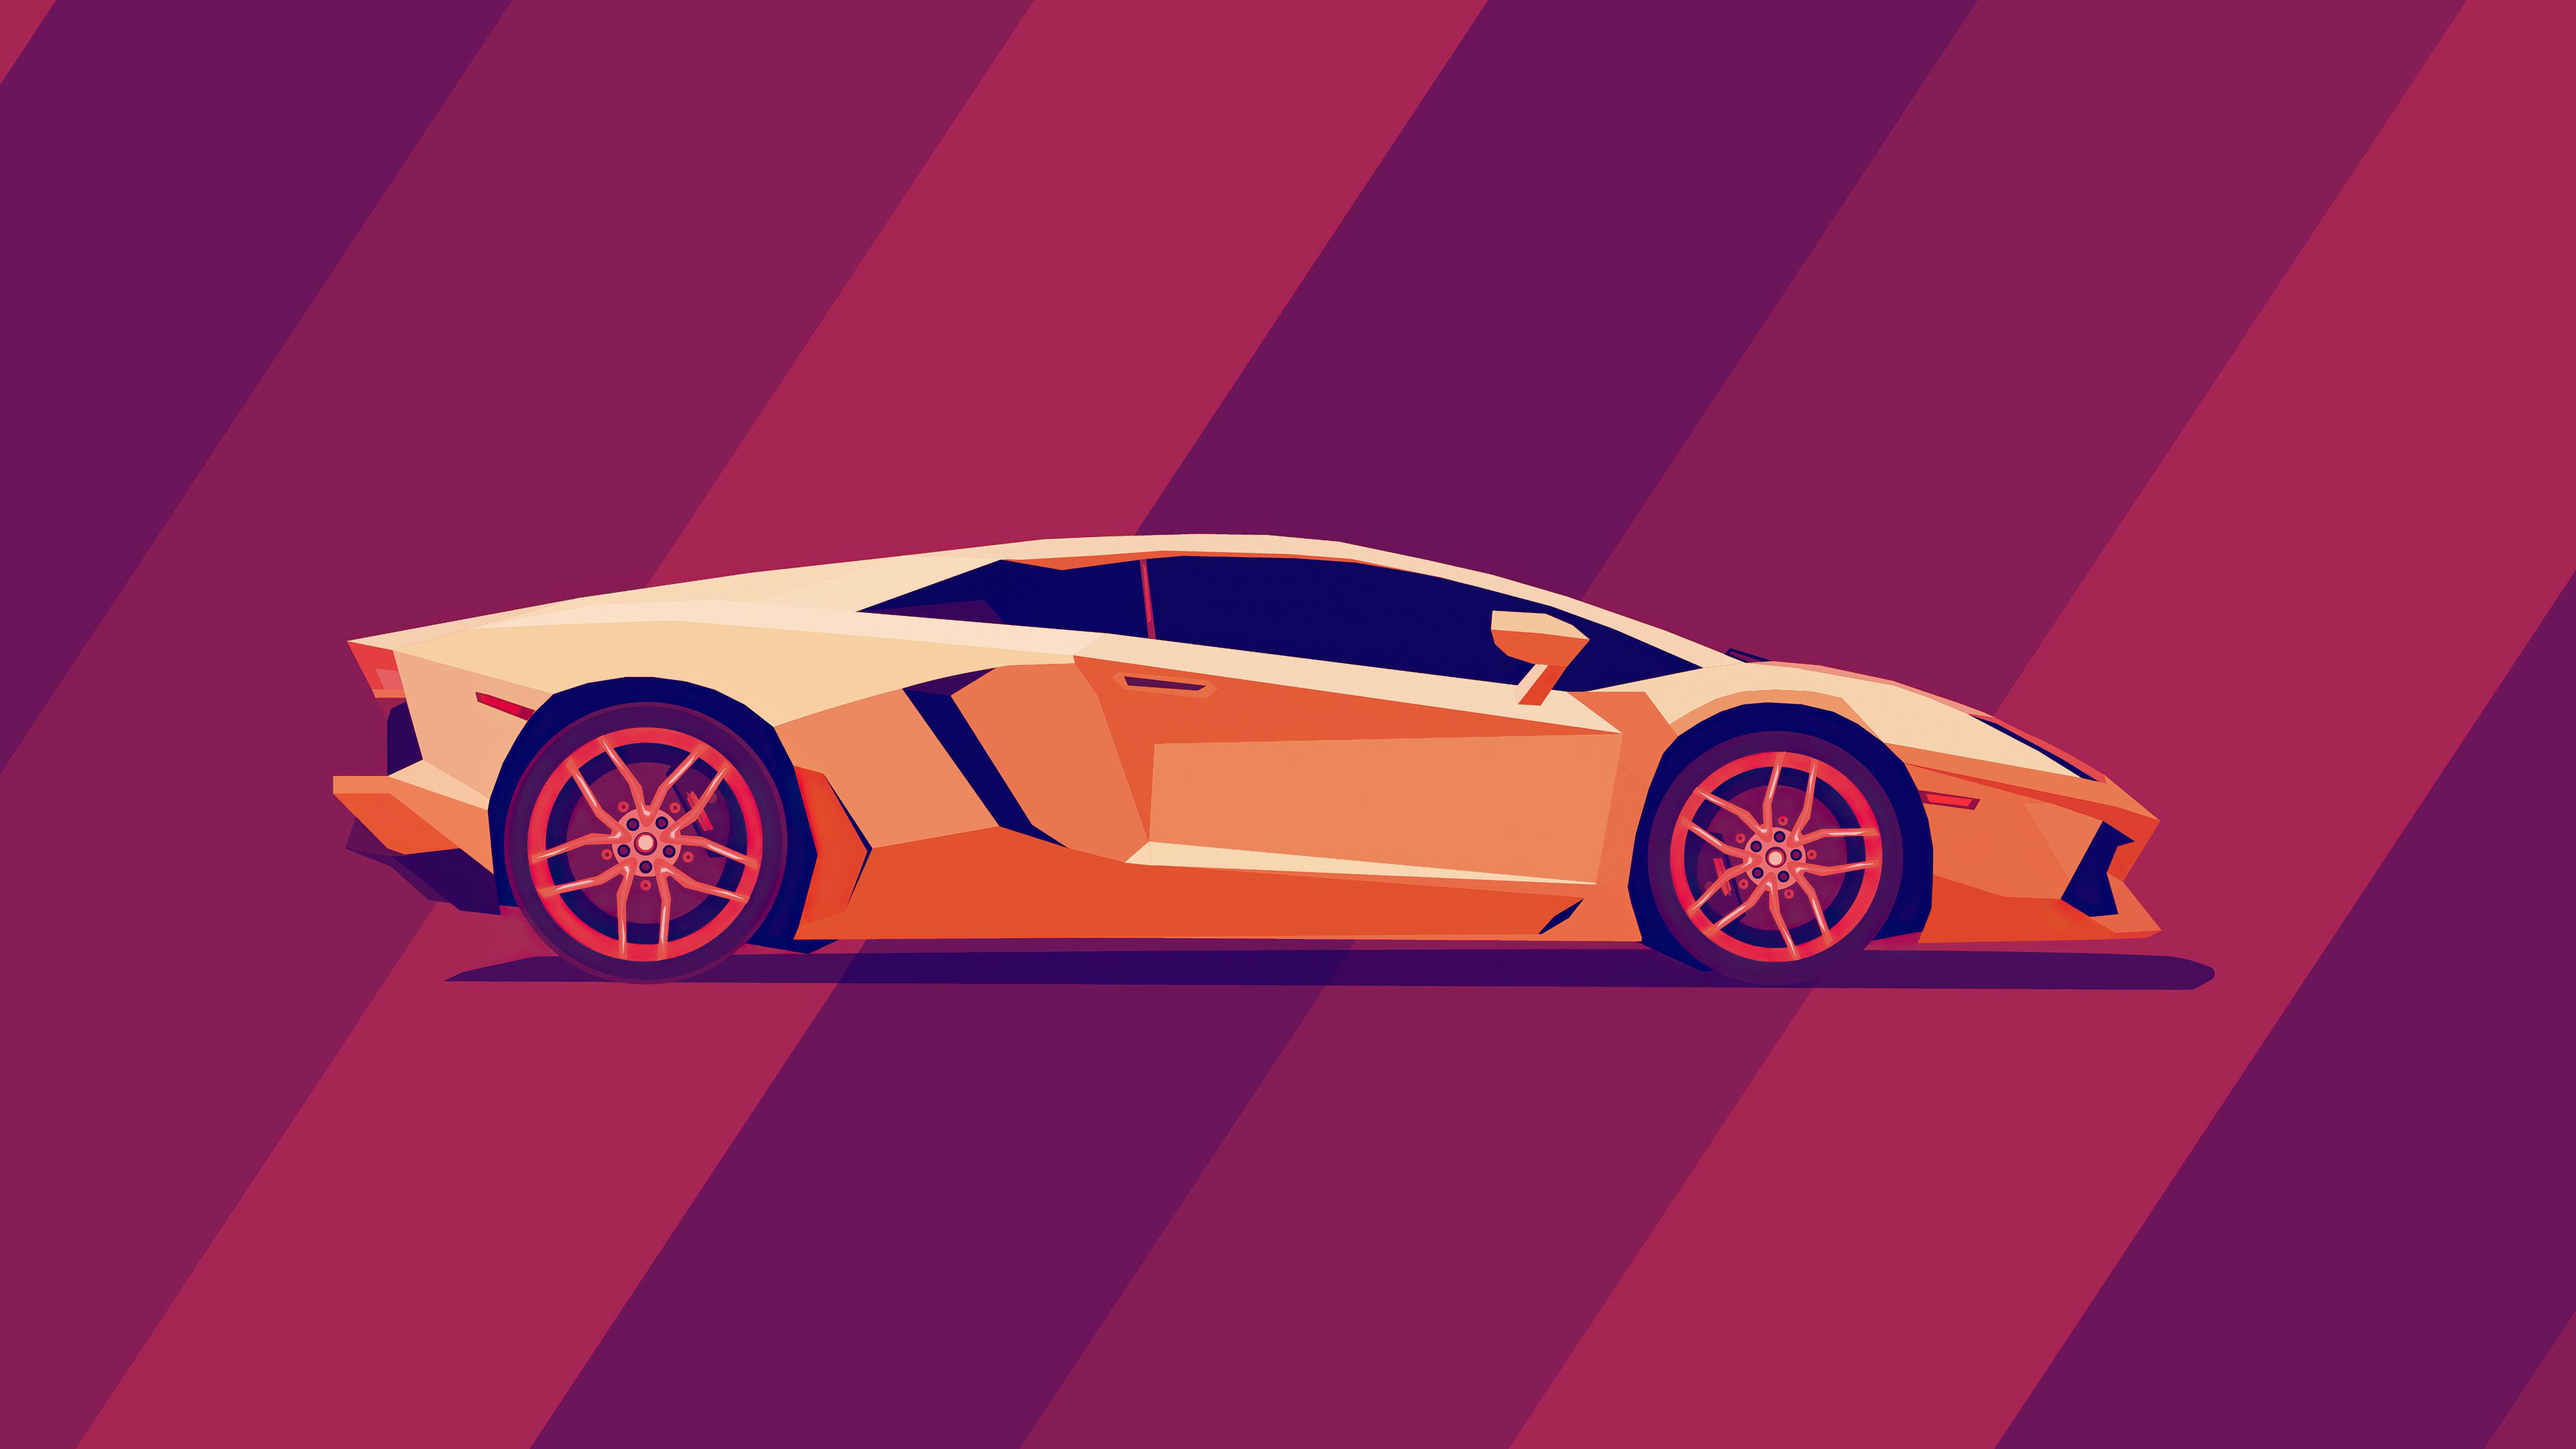 Wallpaper Lamborghini Minimal